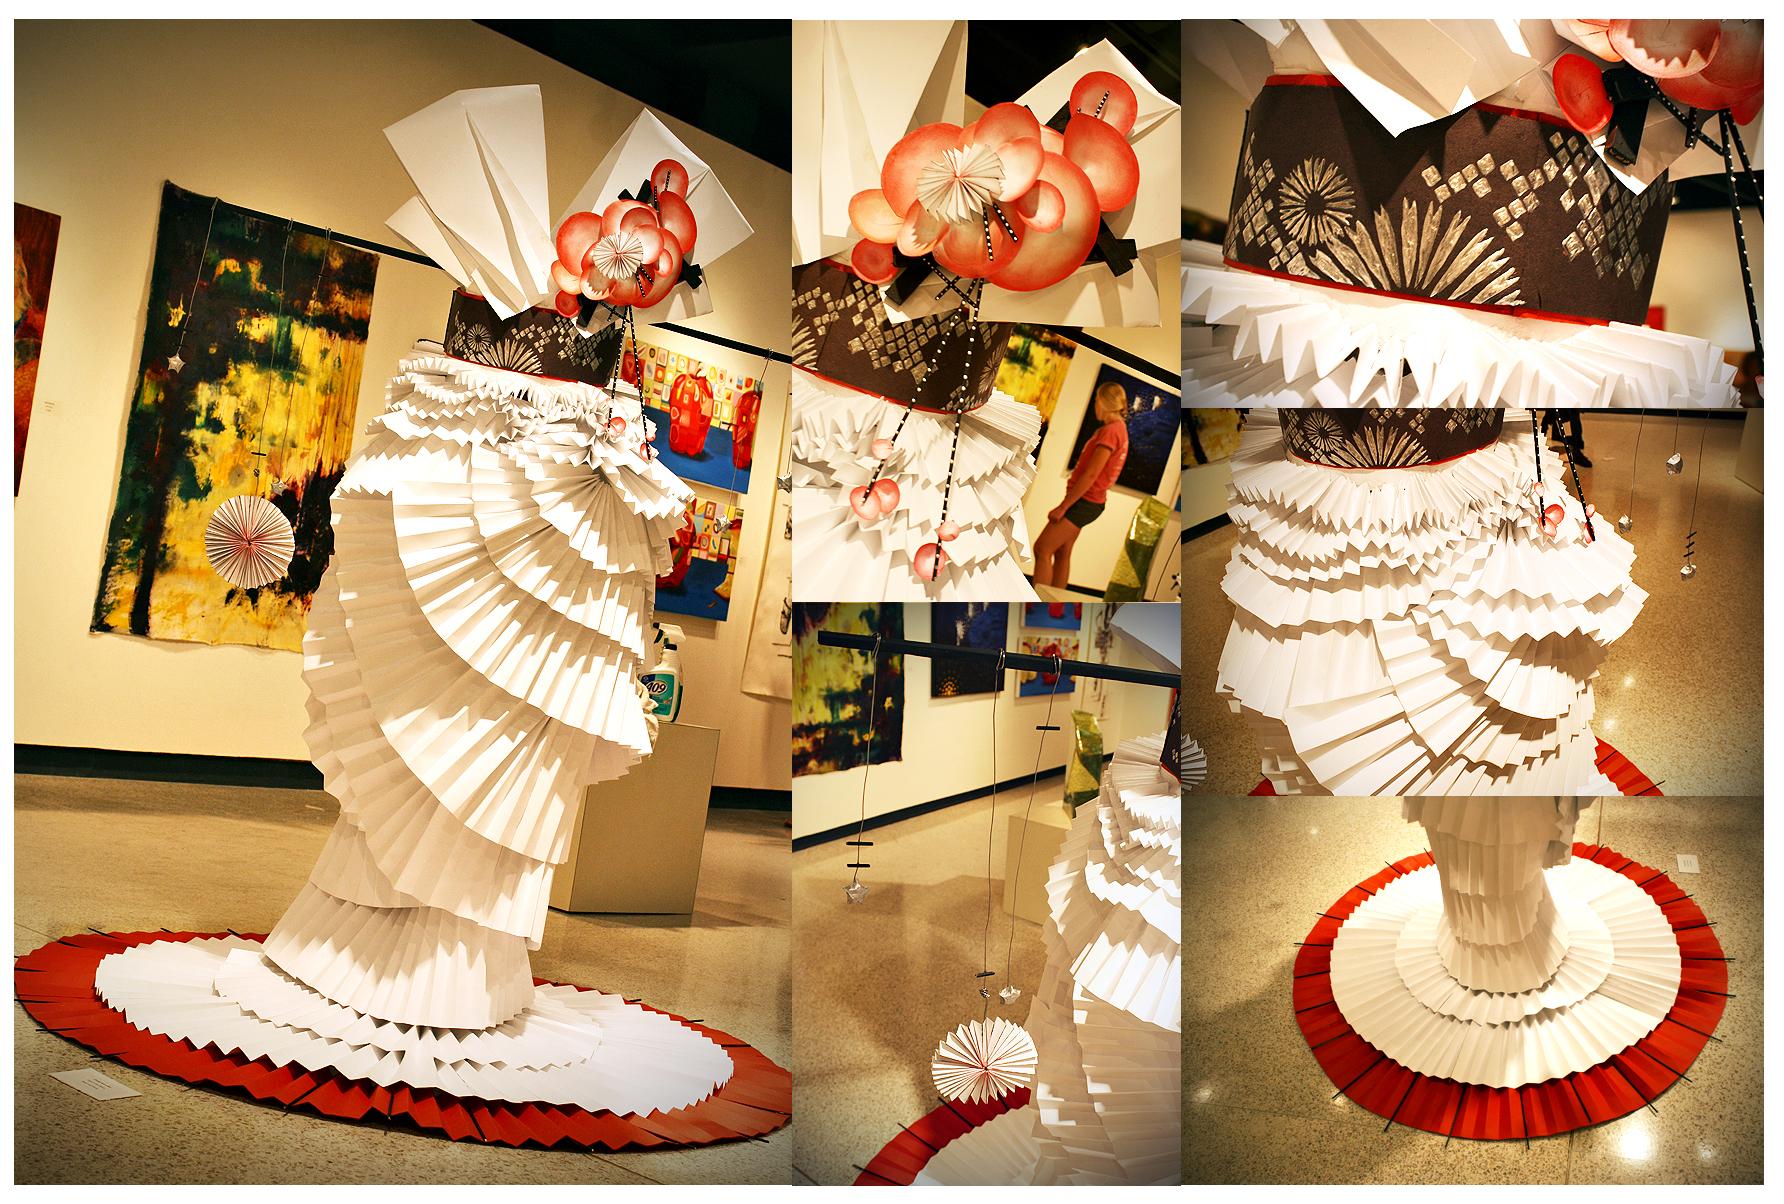 Virgin's First Dance by LiL-KRN-YUNA